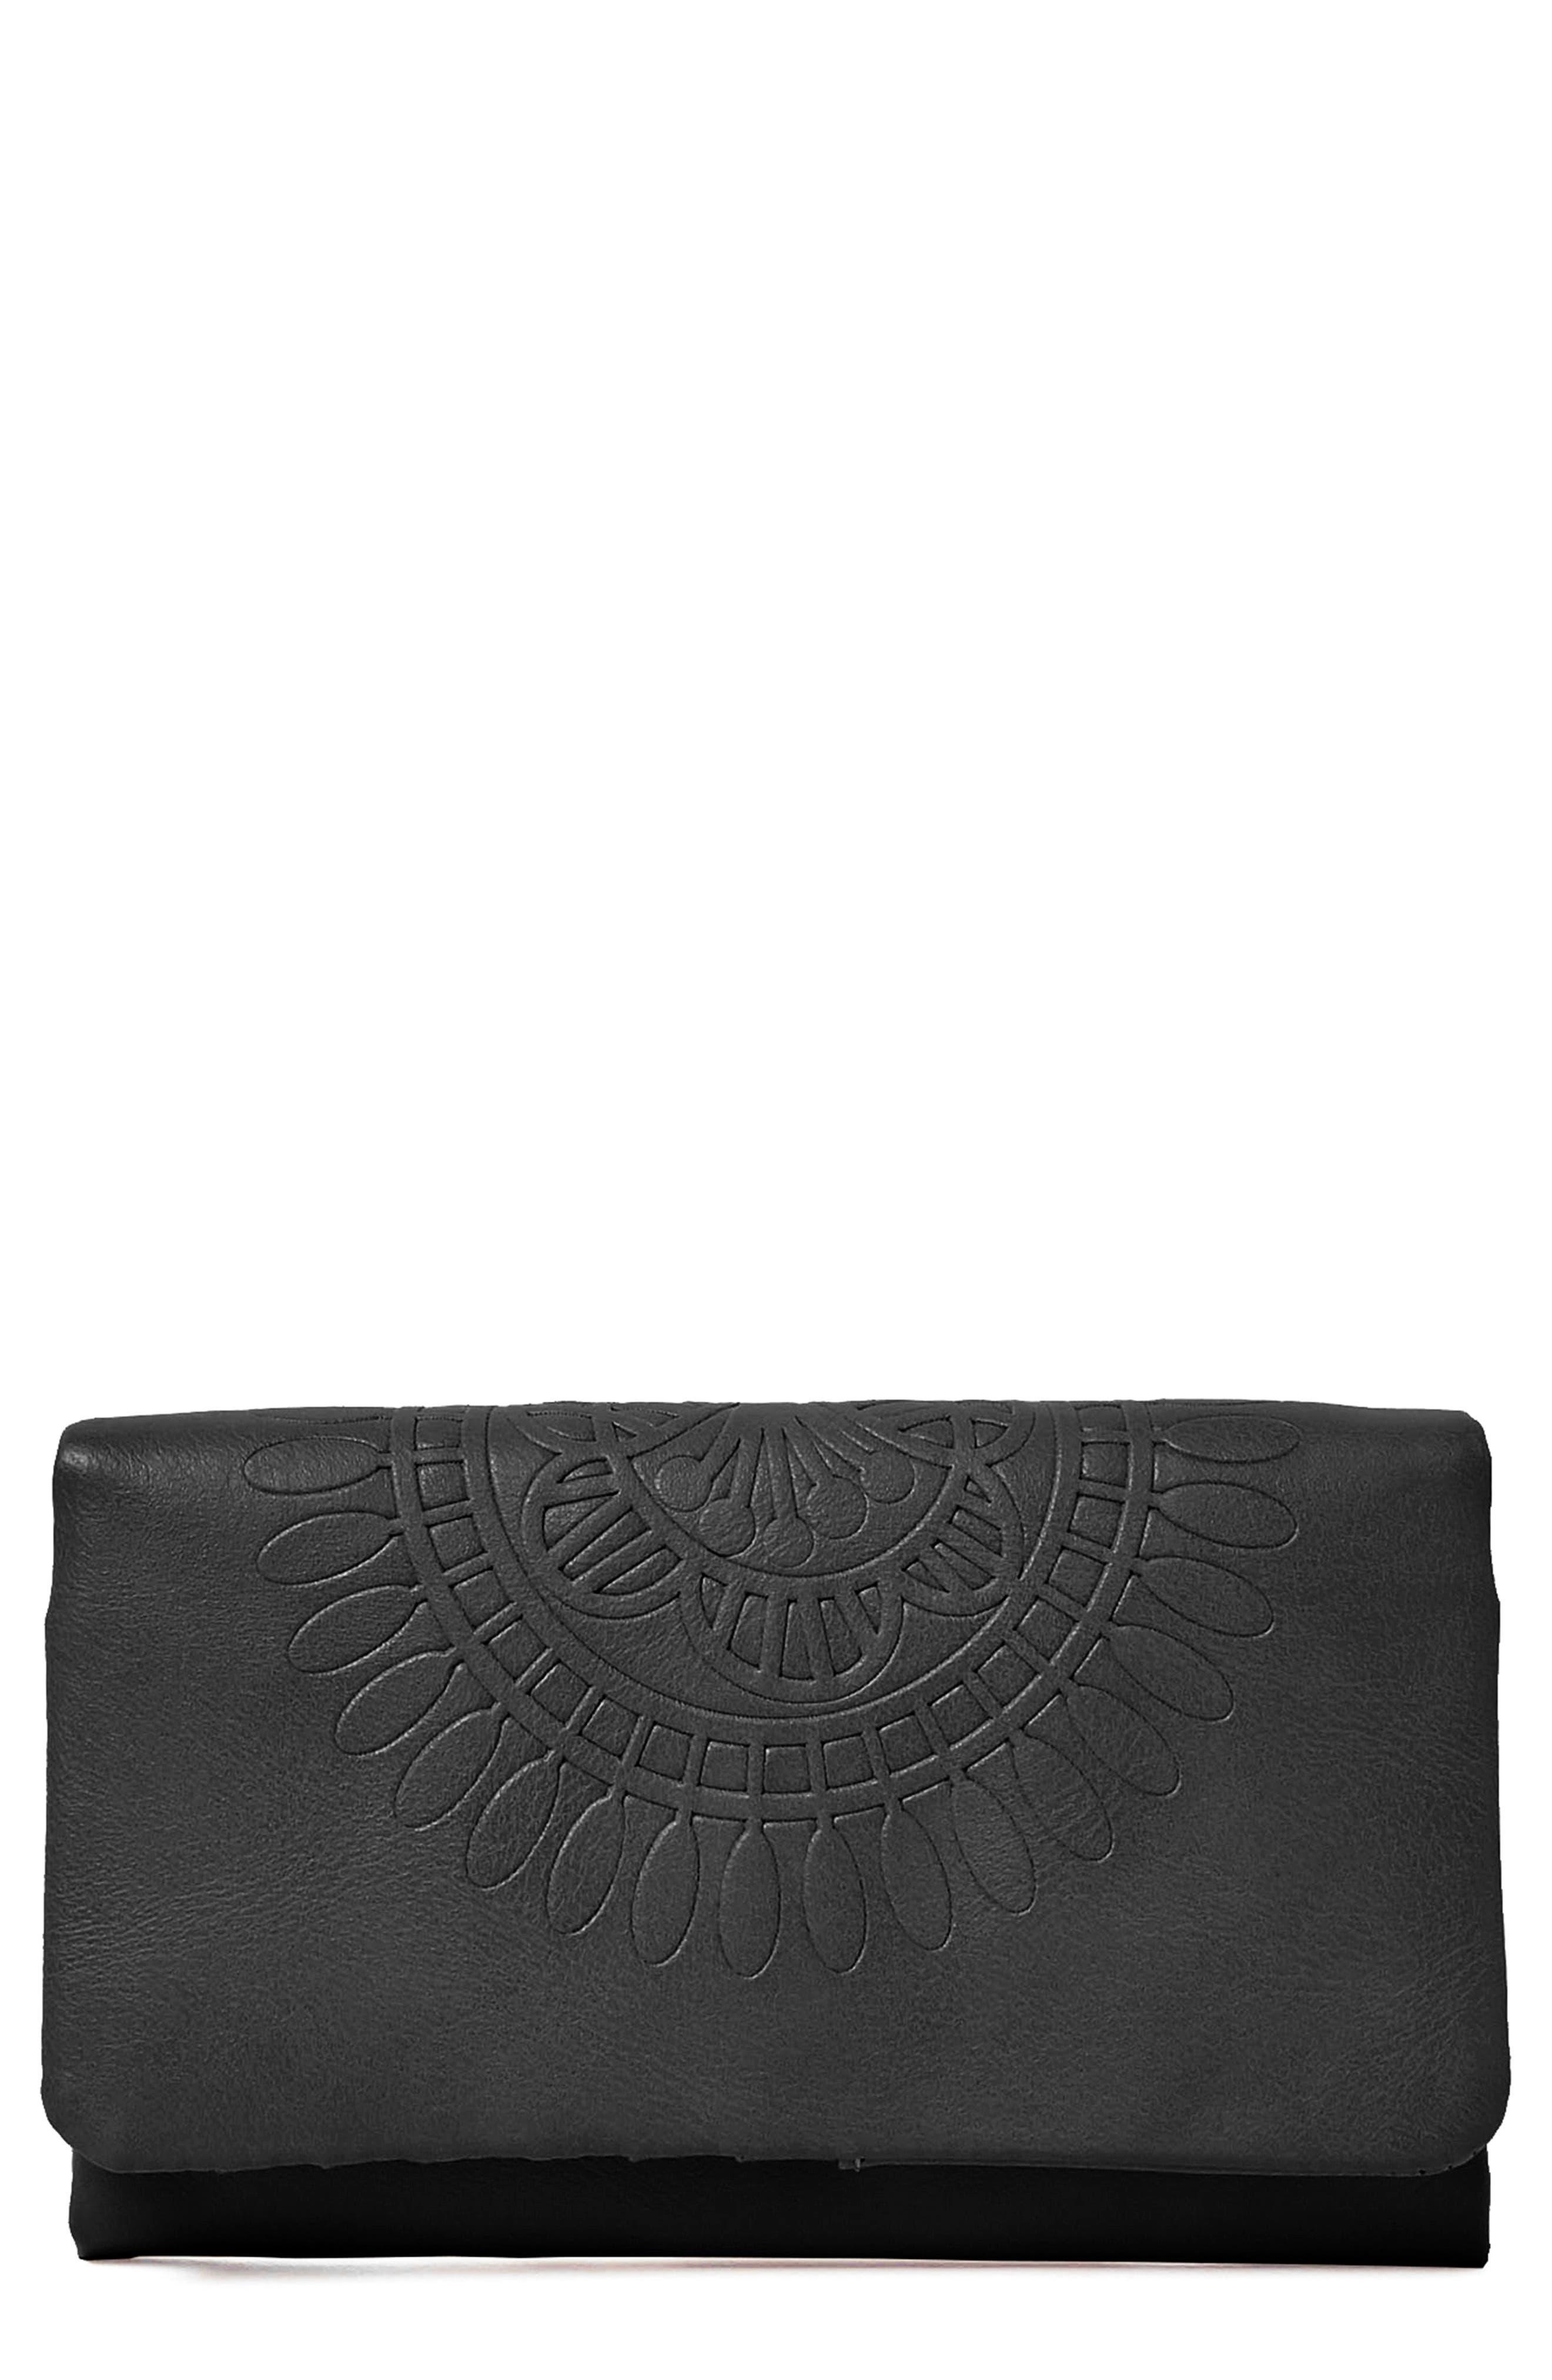 URBAN ORIGINALS, Flower Gypsy Vegan Leather Wallet, Main thumbnail 1, color, 001